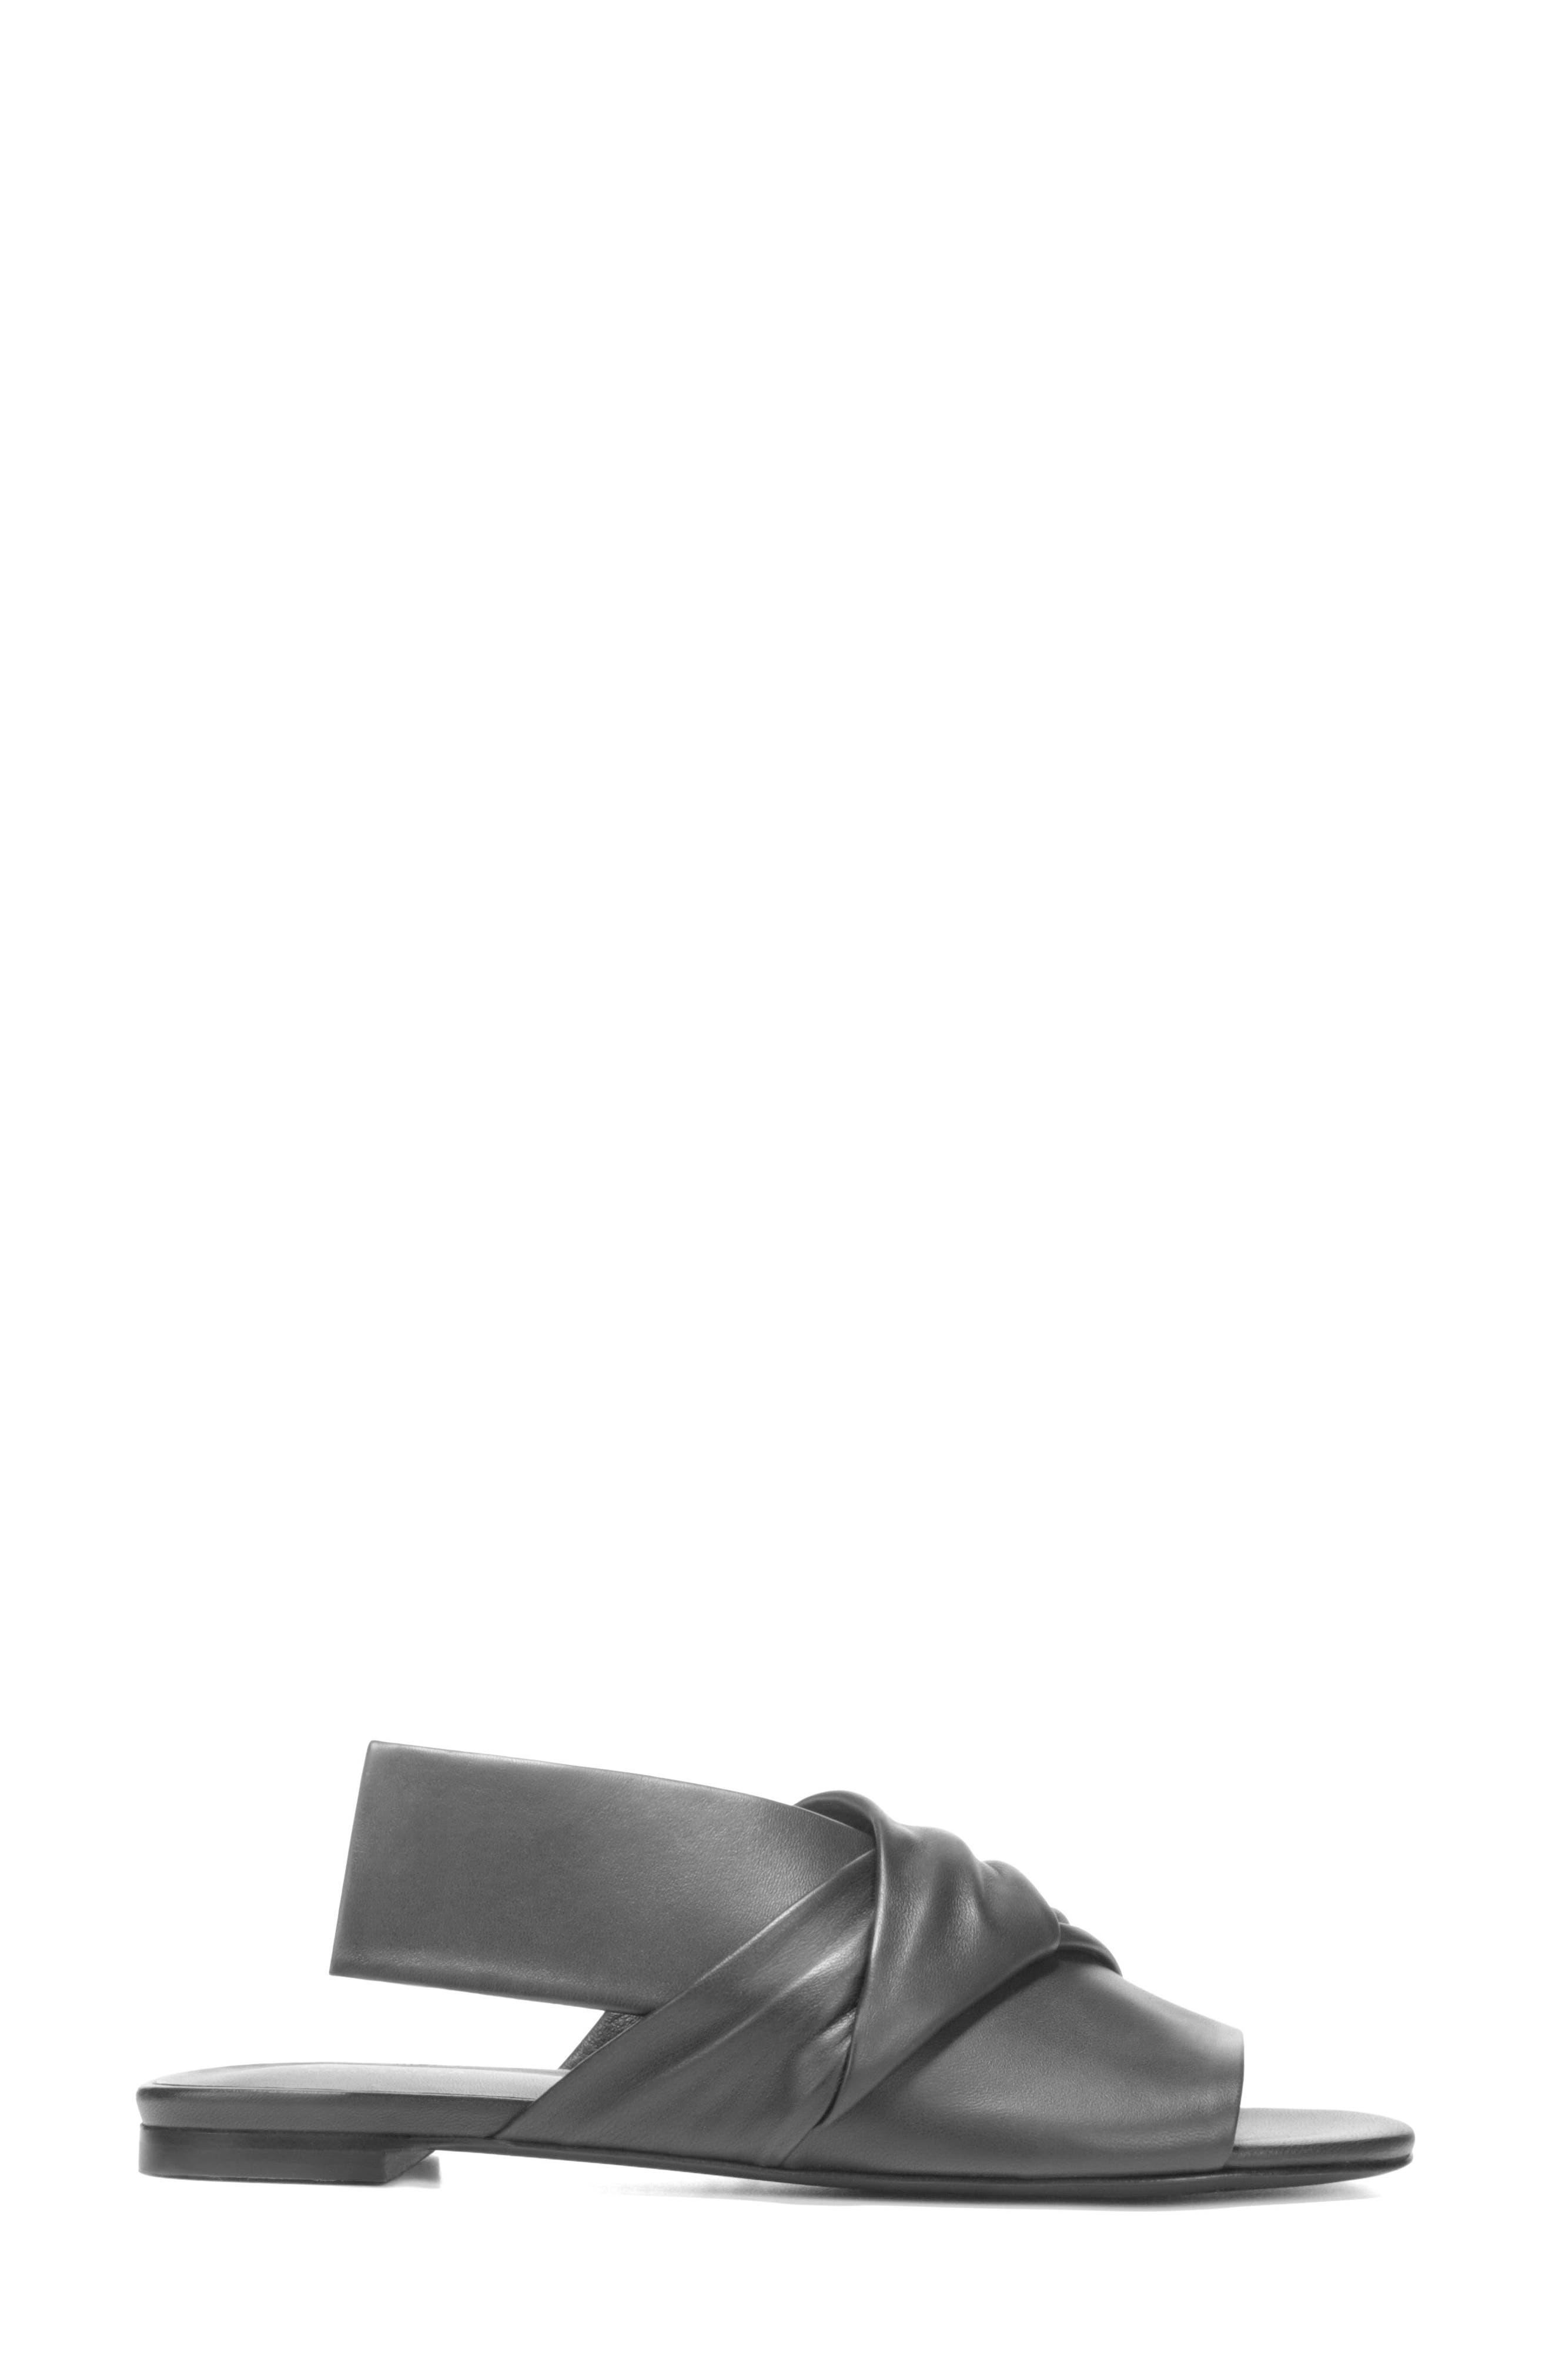 Halina Slide Sandal,                             Alternate thumbnail 3, color,                             BLACK LEATHER